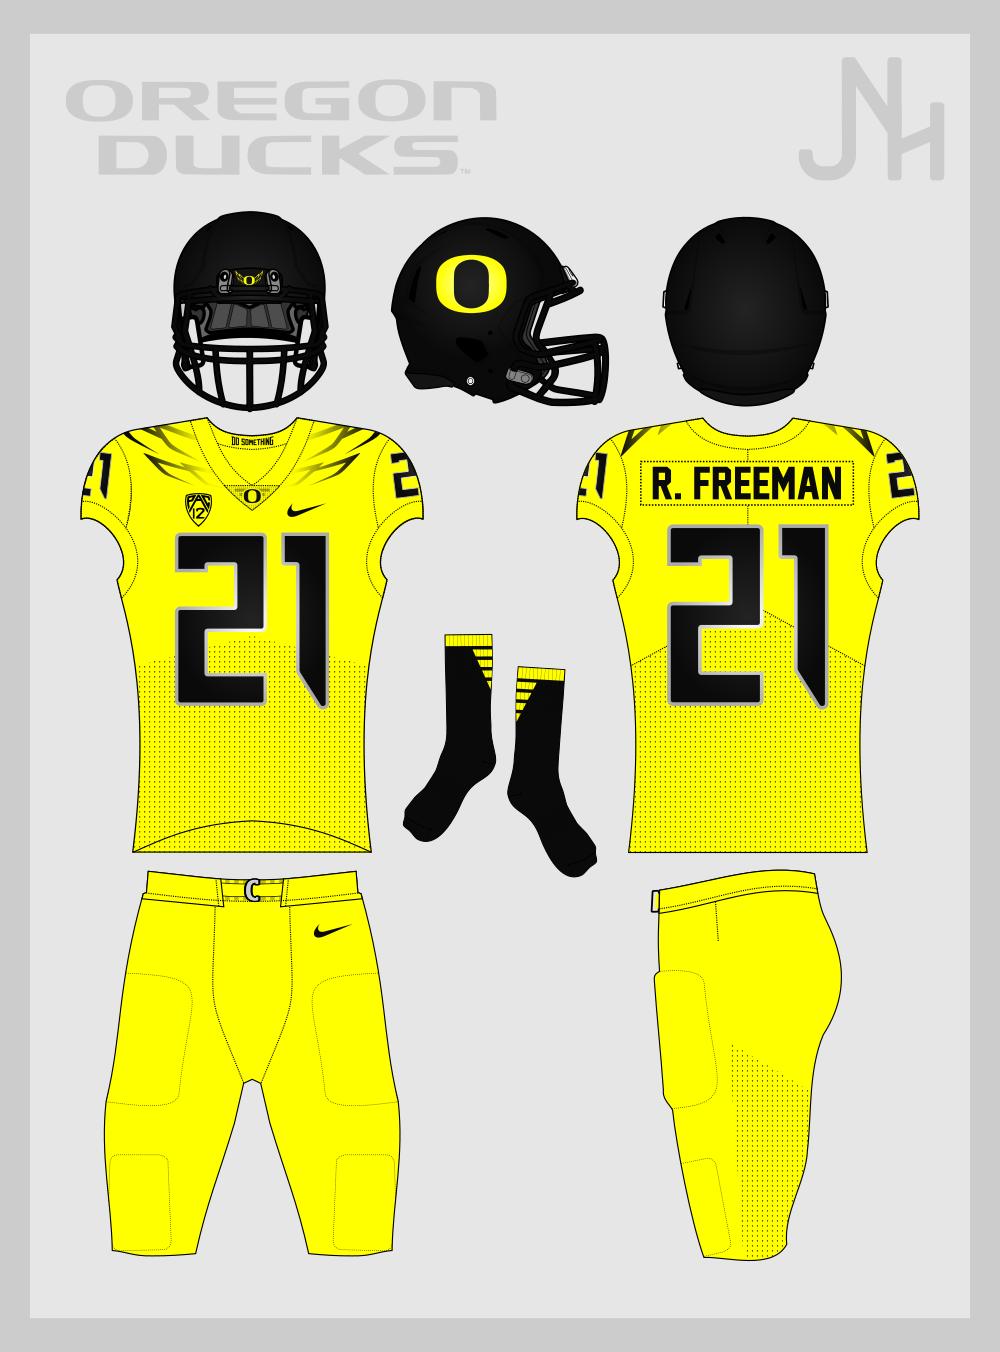 on sale b06b7 e7fd3 Oregon Ducks Football 2017 - Concepts - Chris Creamer's ...